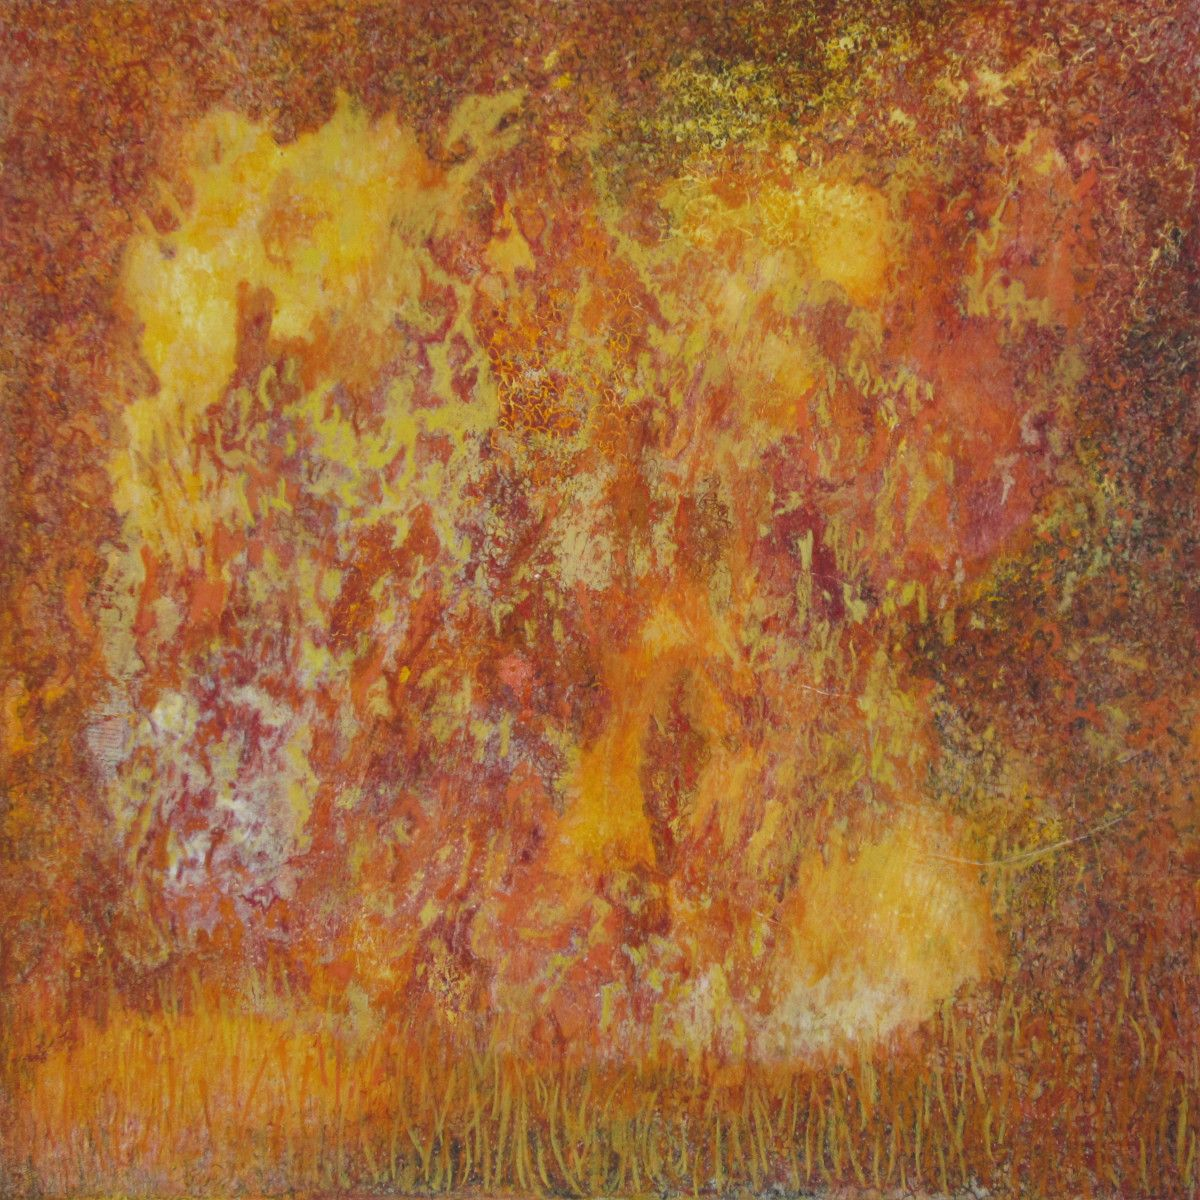 Maria Hughes. Golden Dream, Monotype, 20 x 20 in. SOLD.